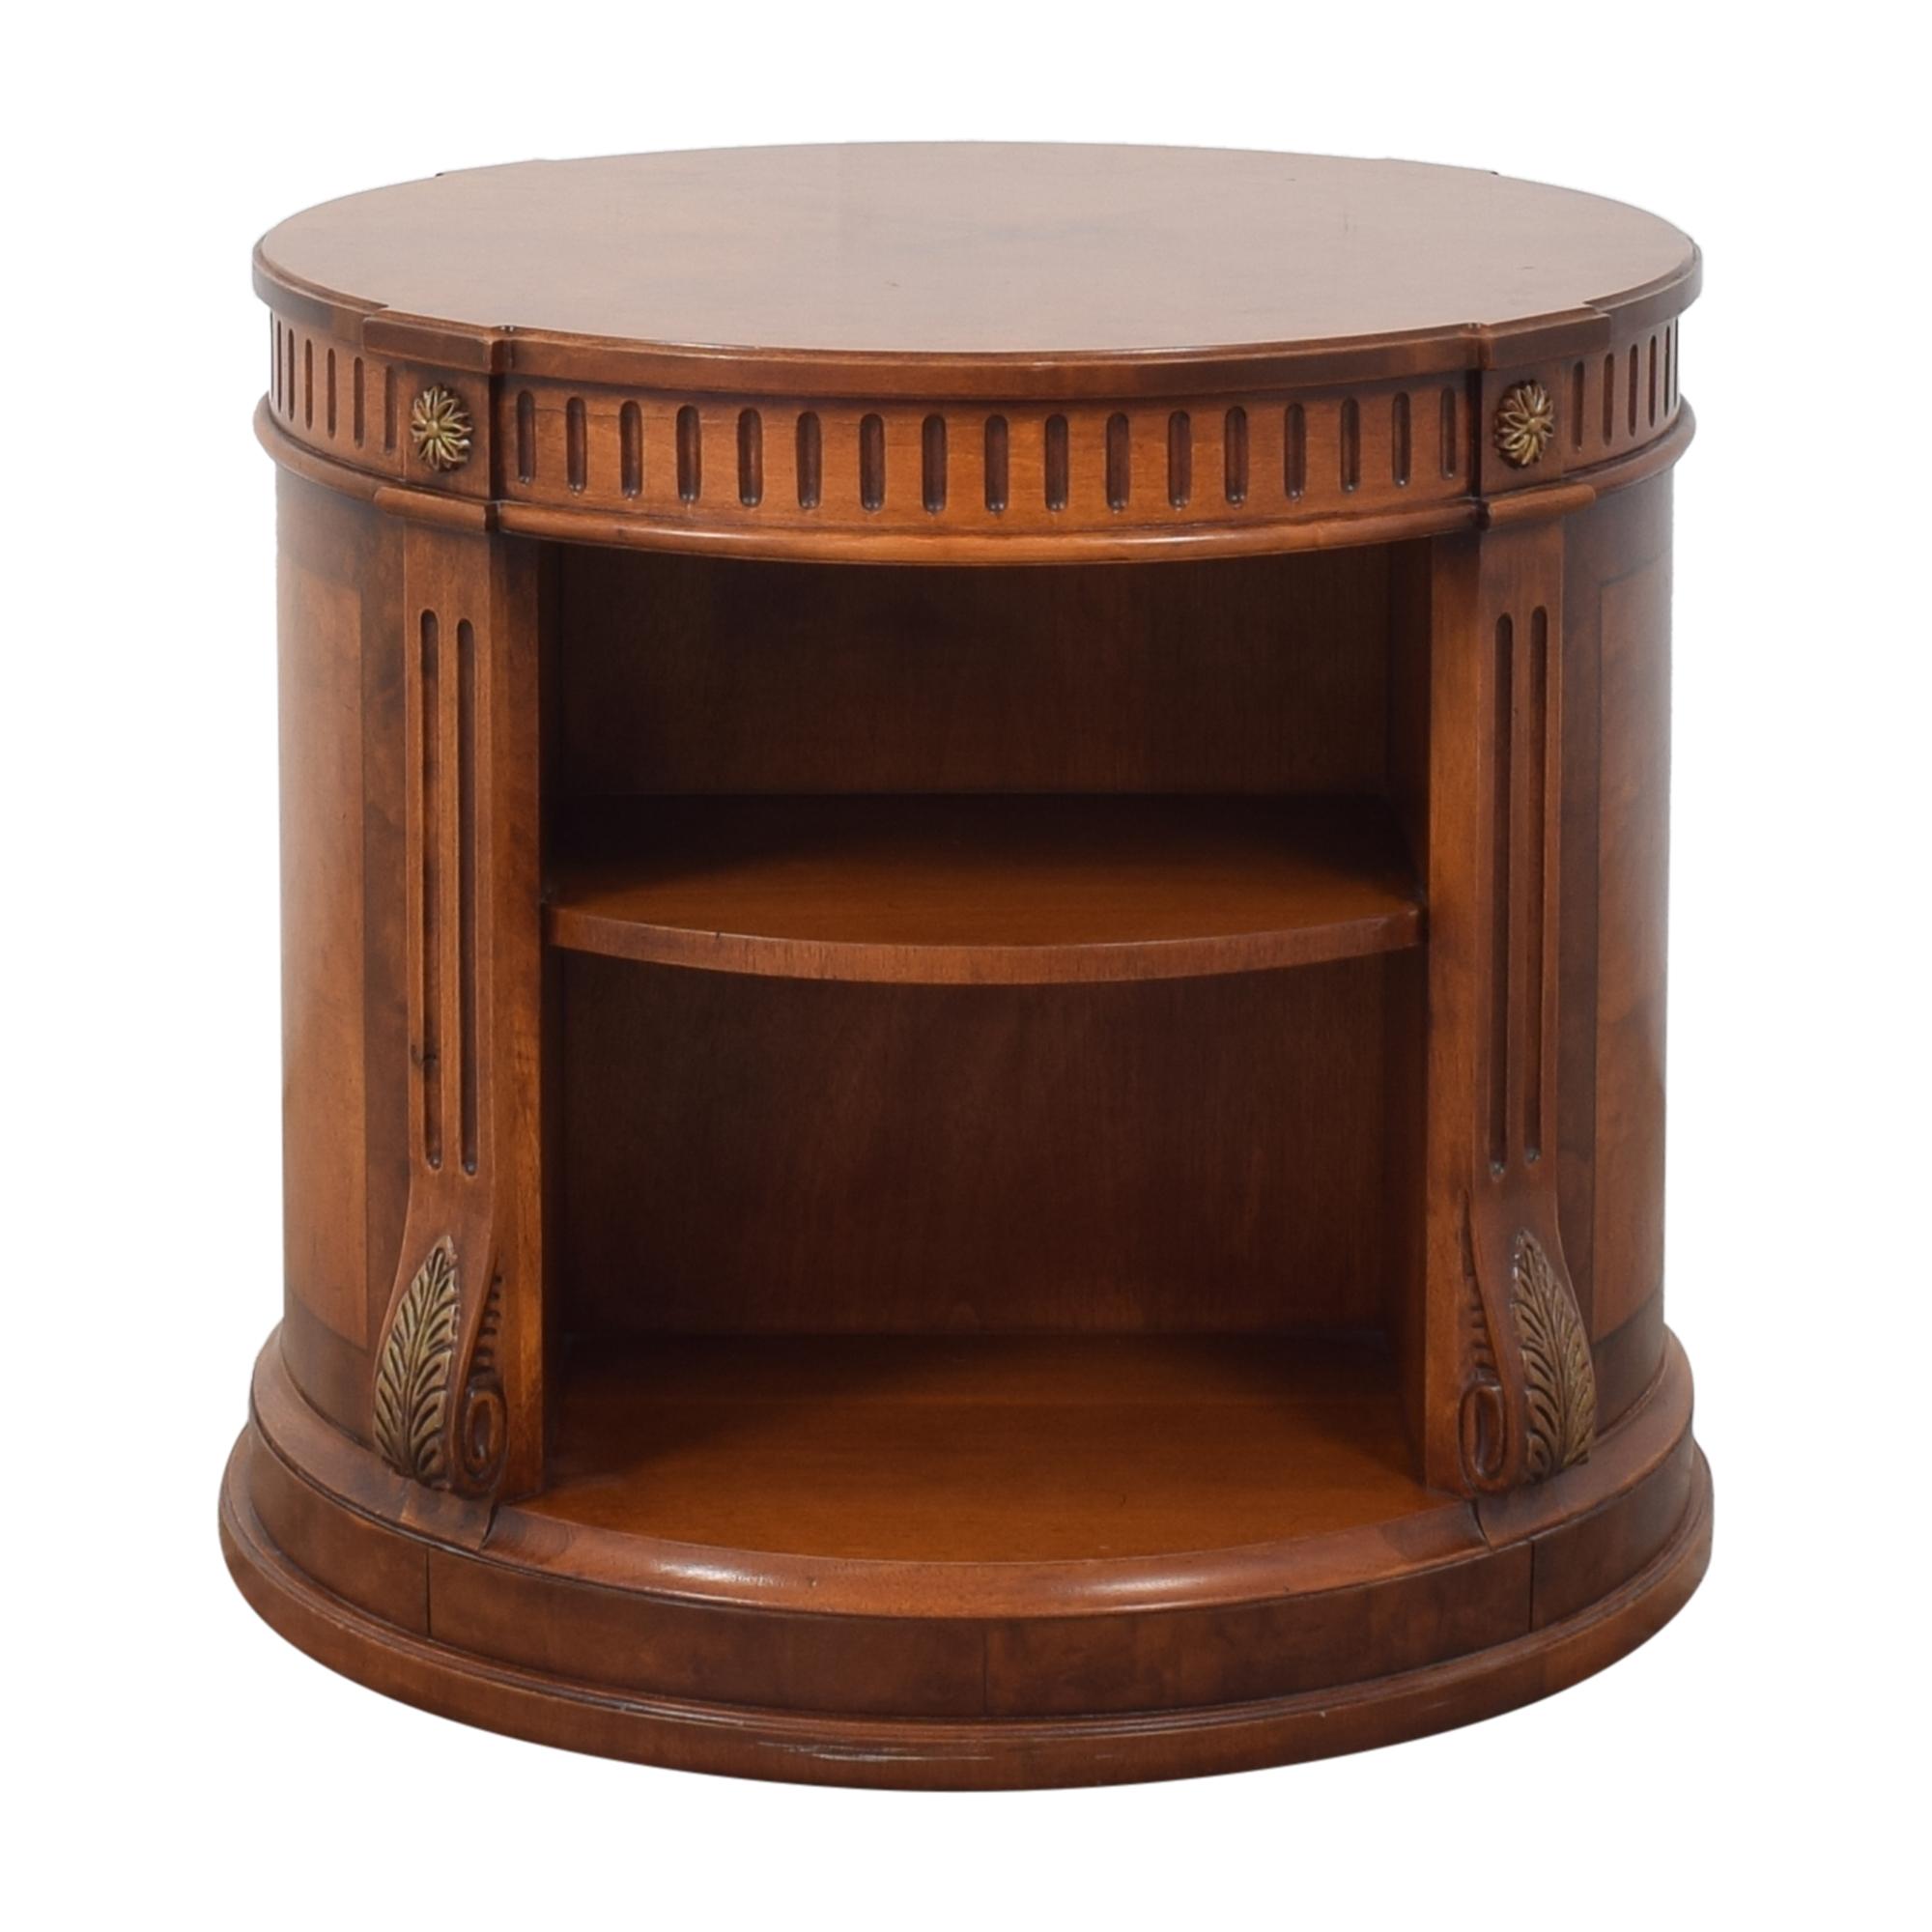 Henredon Furniture Henredon Furniture Round Side Table second hand